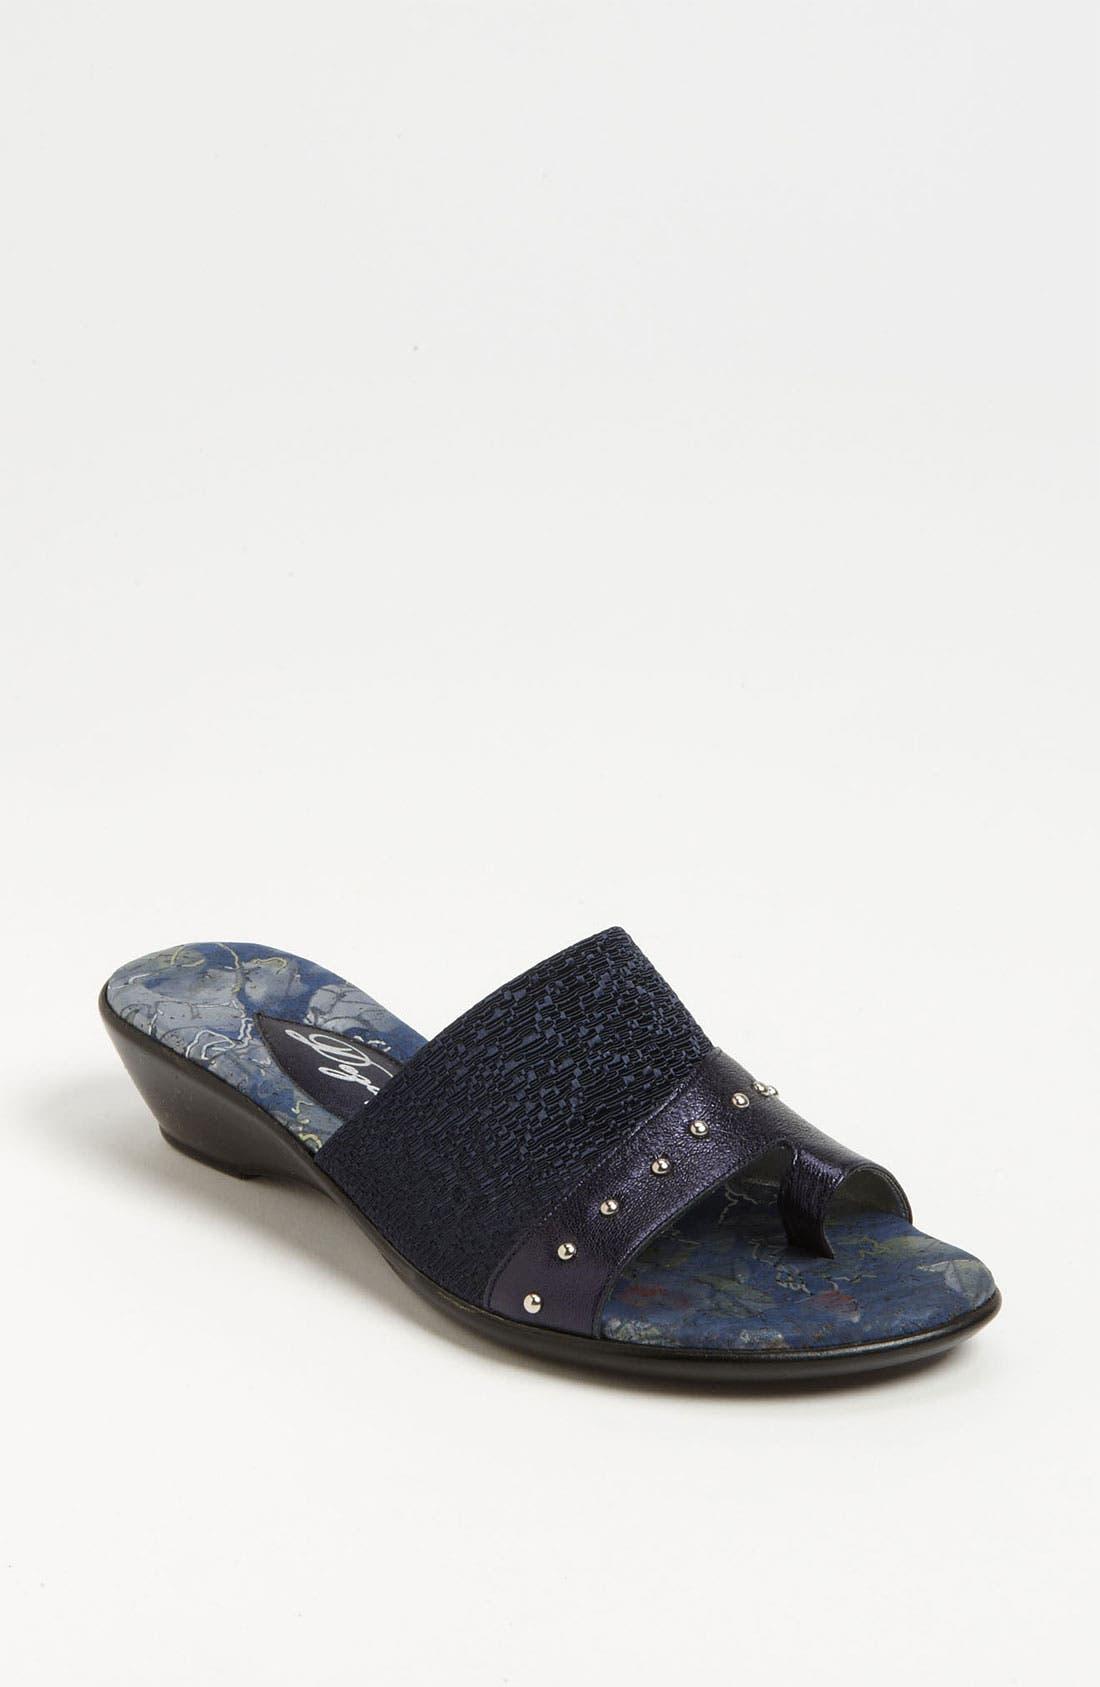 Alternate Image 1 Selected - Dezario 'Nemo' Sandal